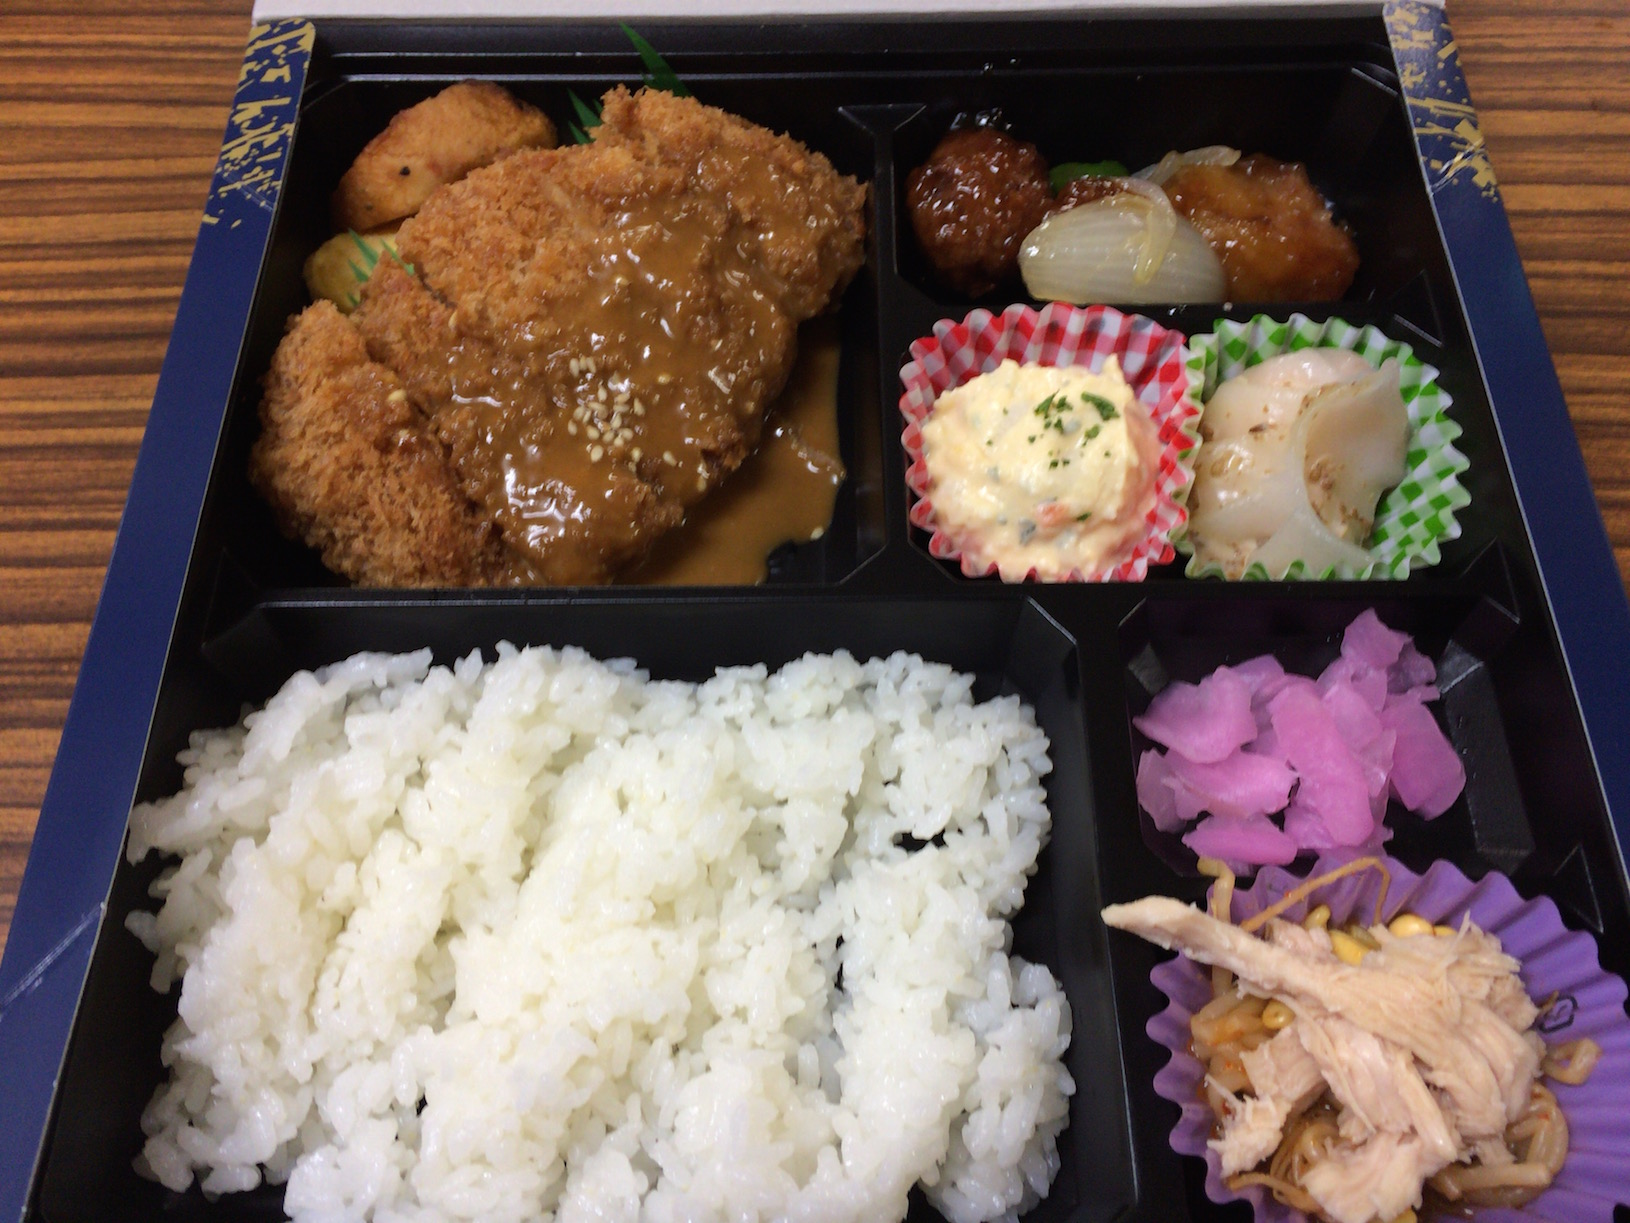 大阪演歌仕込み昼弁